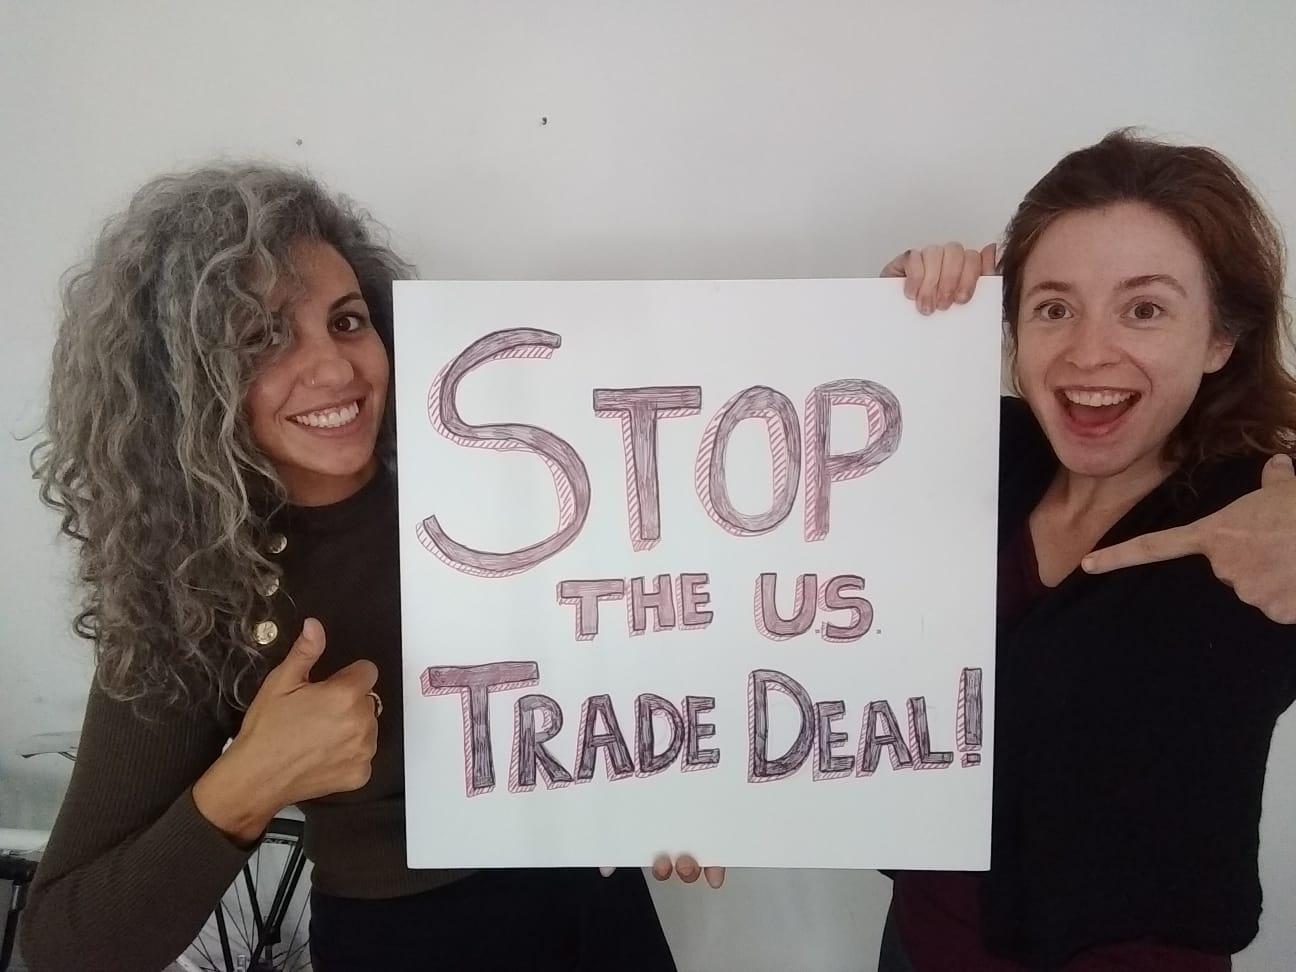 Stop the US Trade Deal selfie